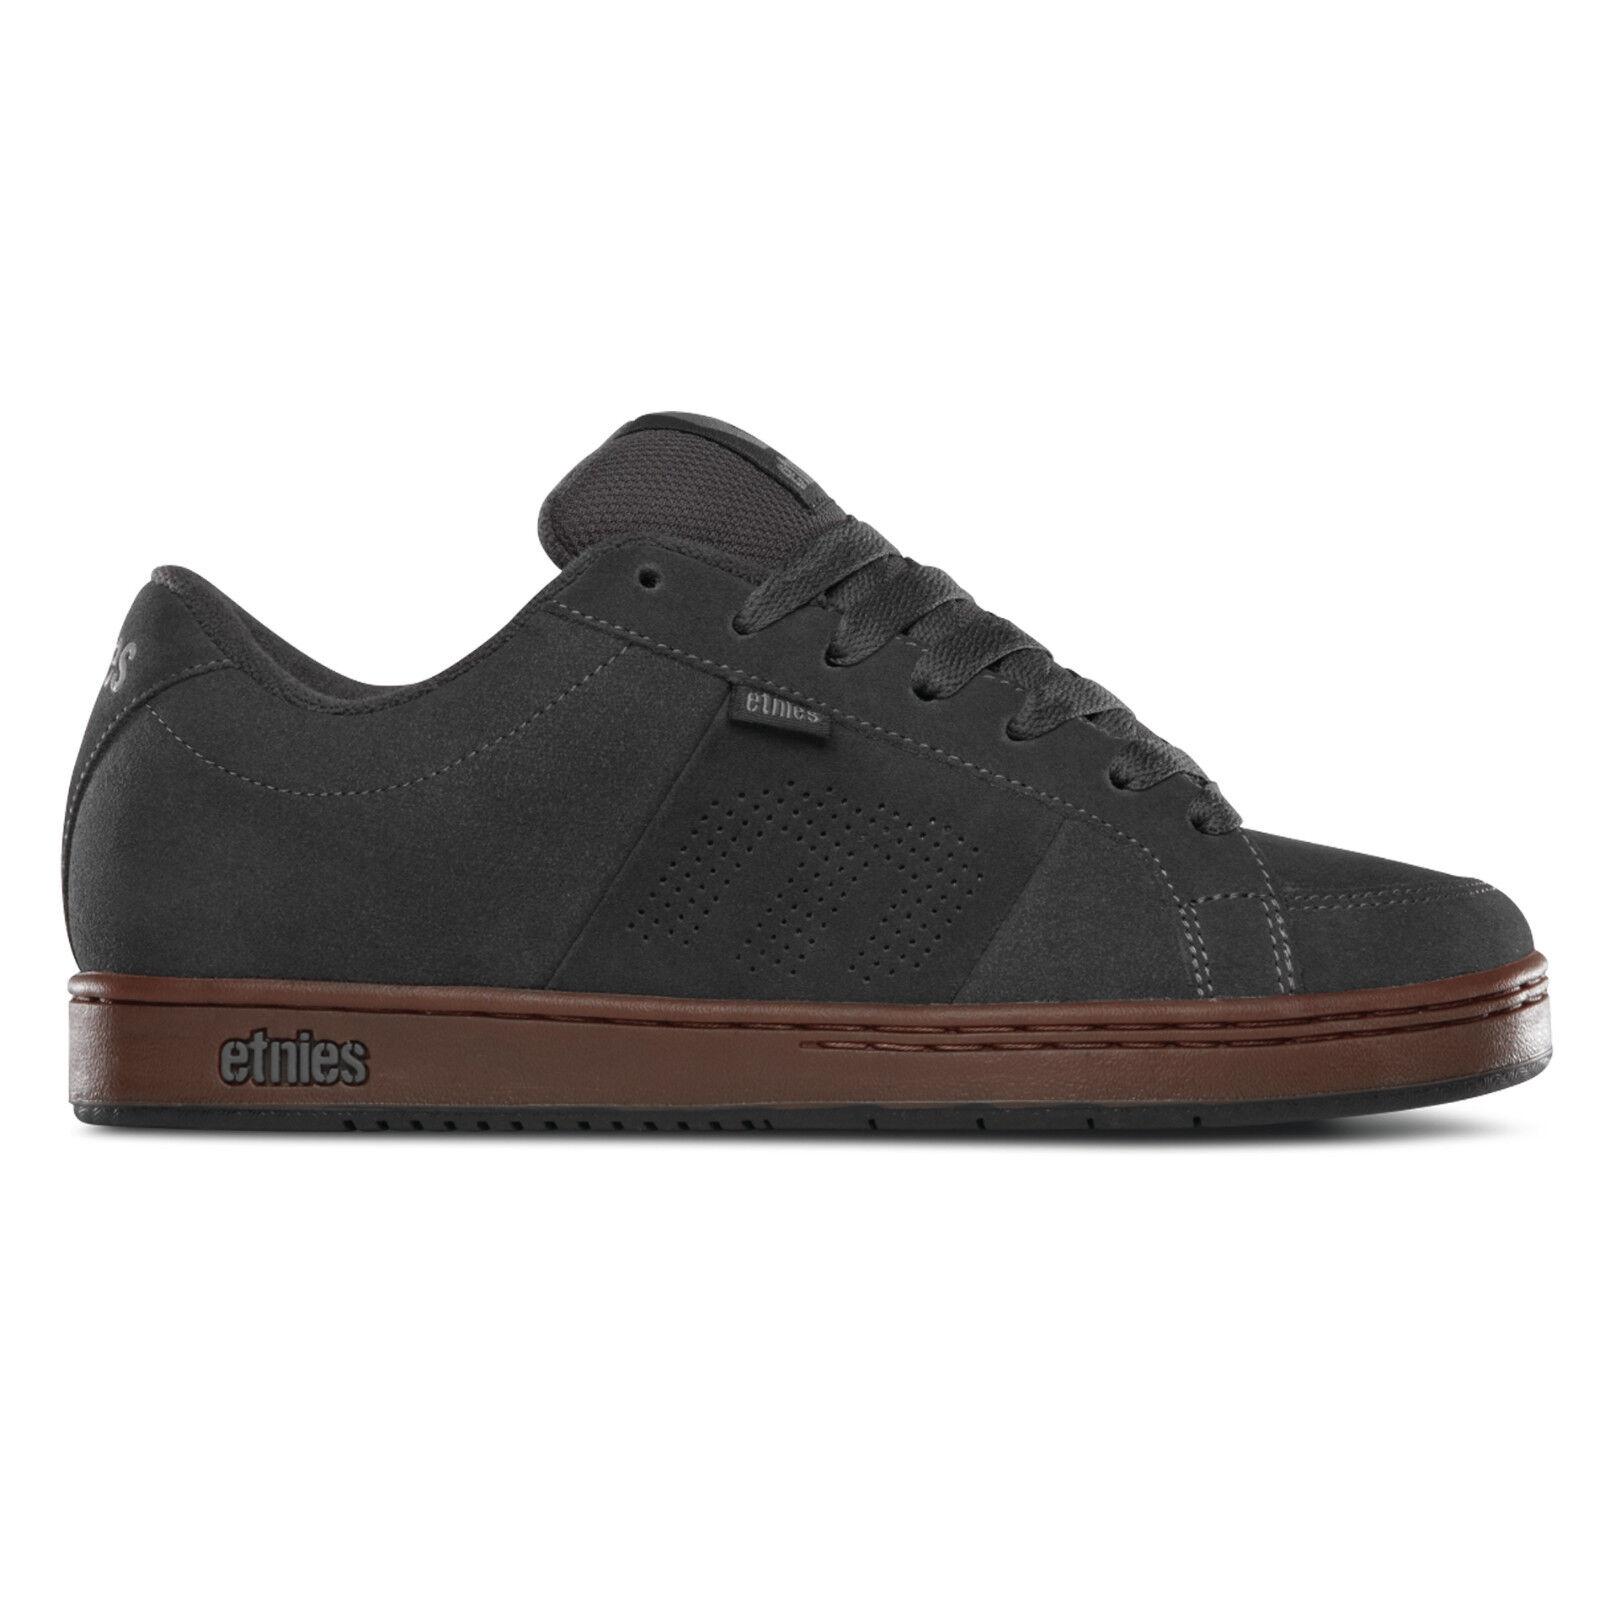 Etnies - Kingpin Sneaker Herren Skate Darkgrey/Black/Gum Skateschuh Schuhe